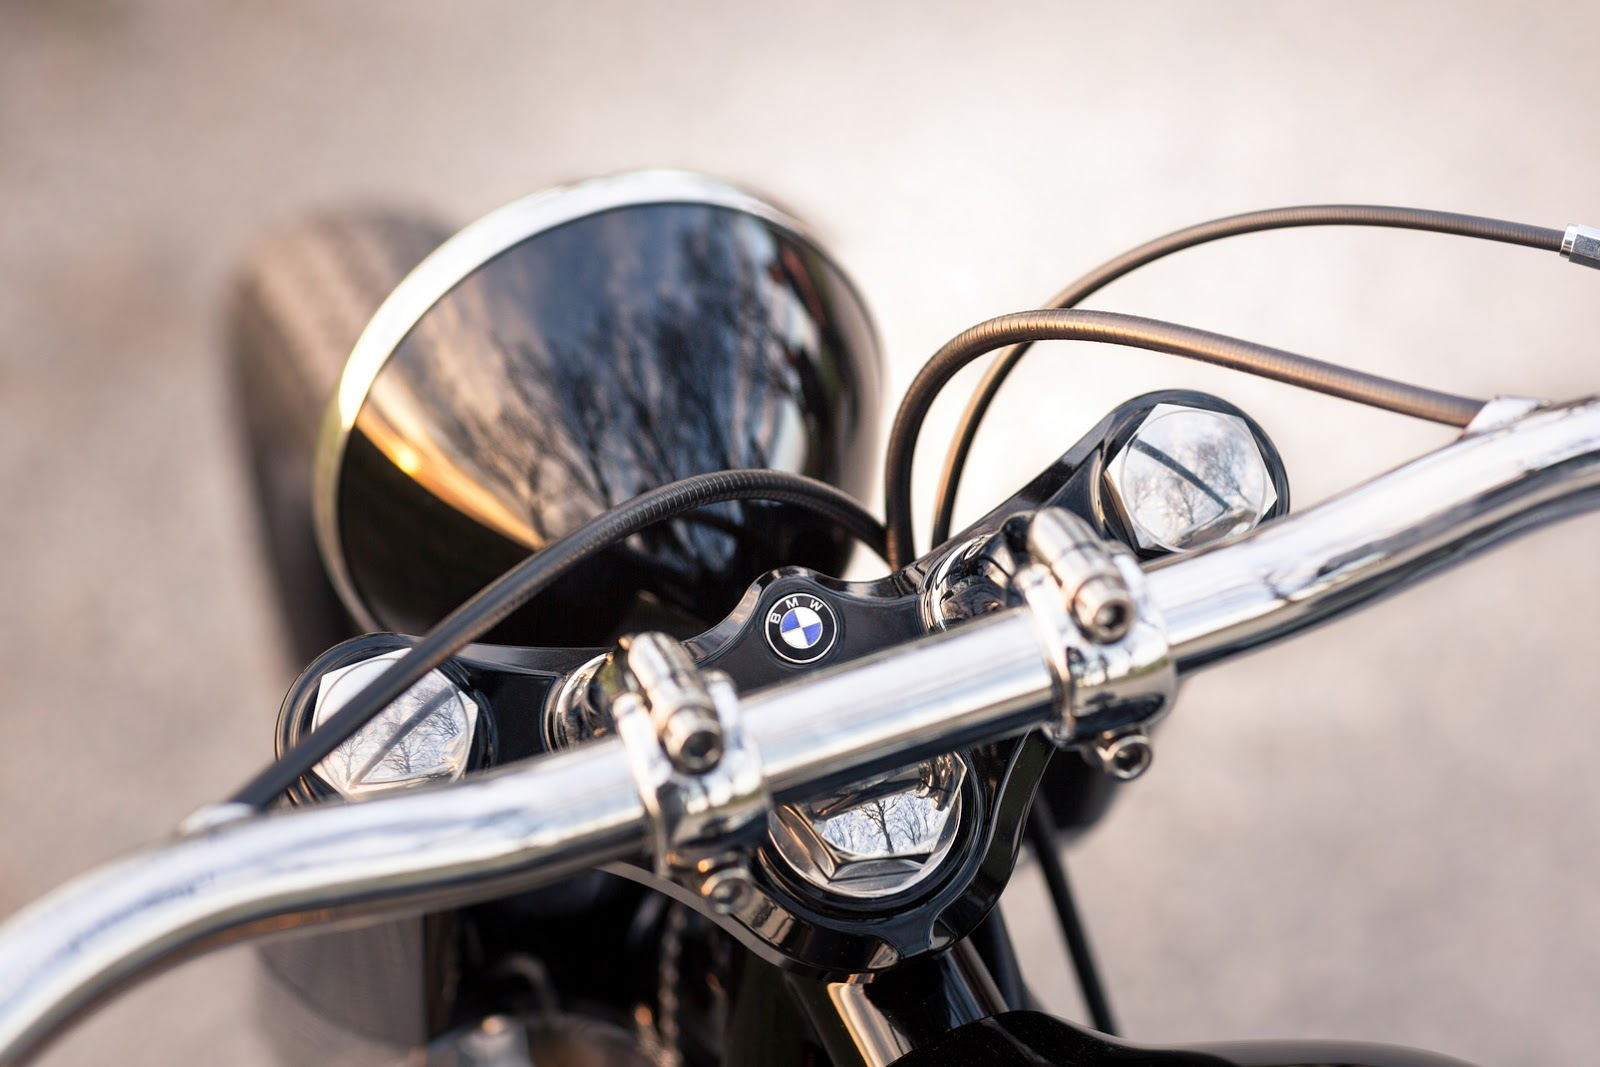 bmw-r5-hommage-bike-villa-deste-66-autonovosti.me-12